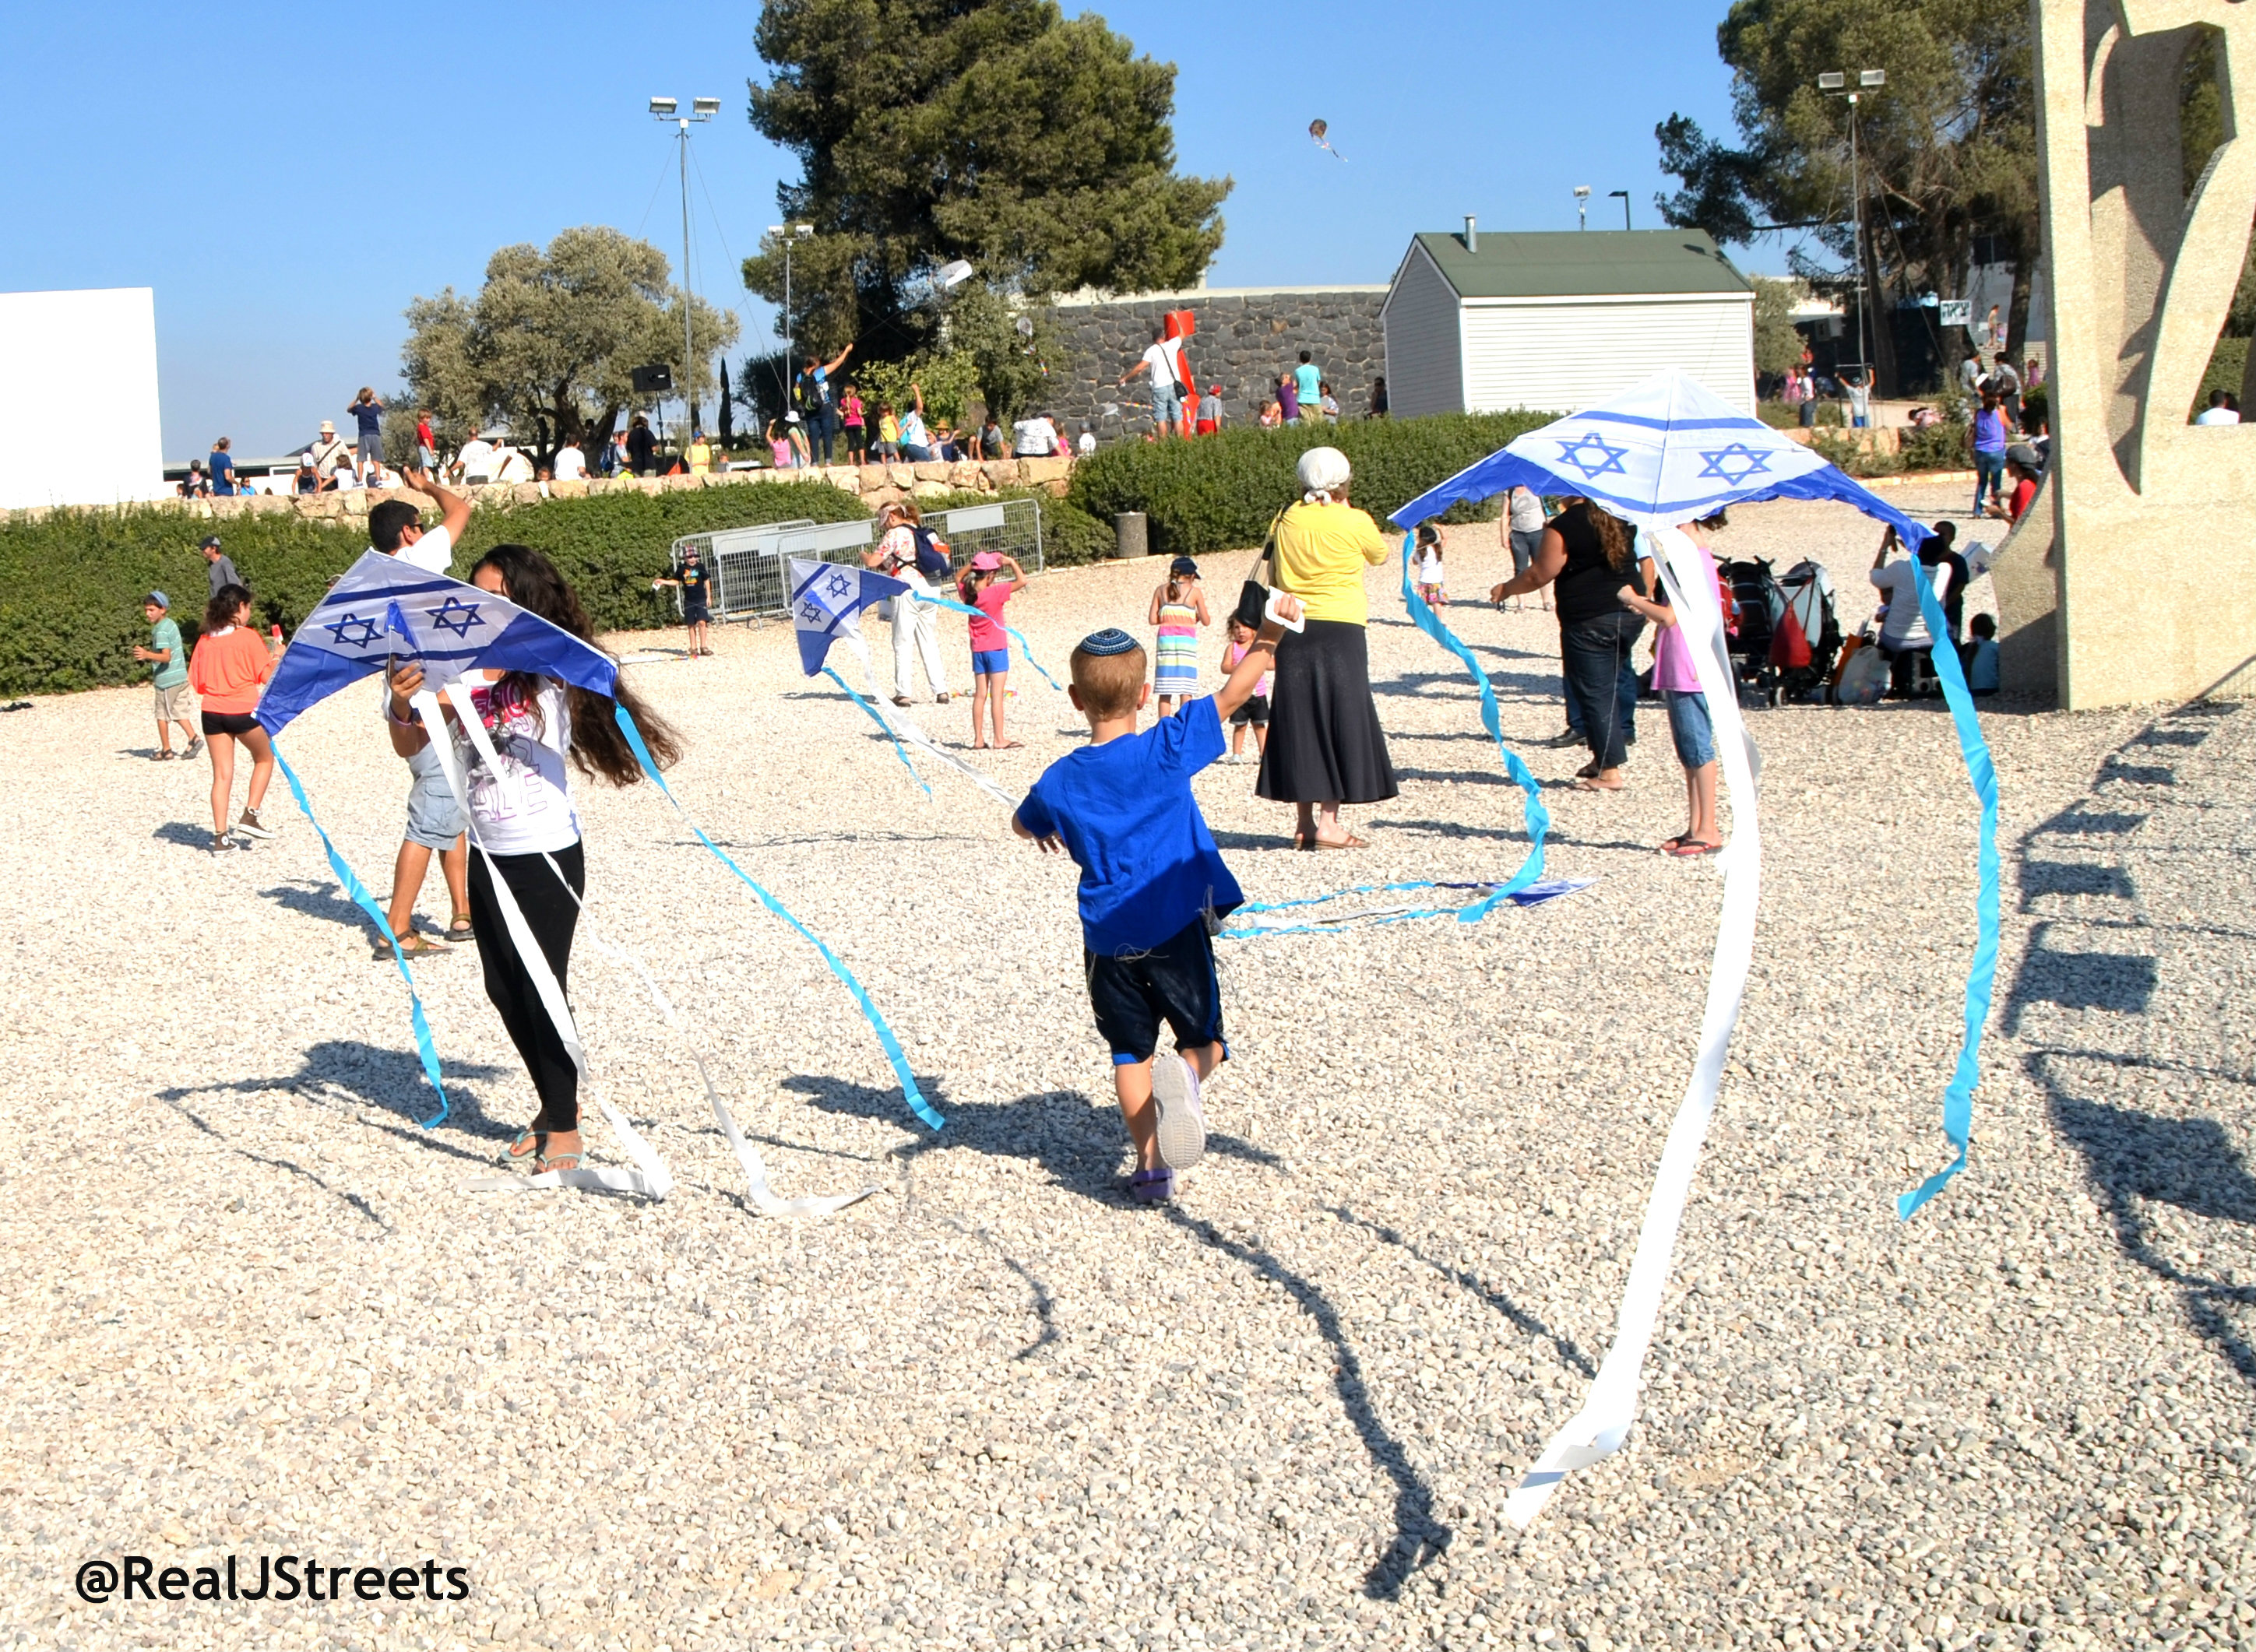 kites flying, Jerusalem kite festival Israel Museum